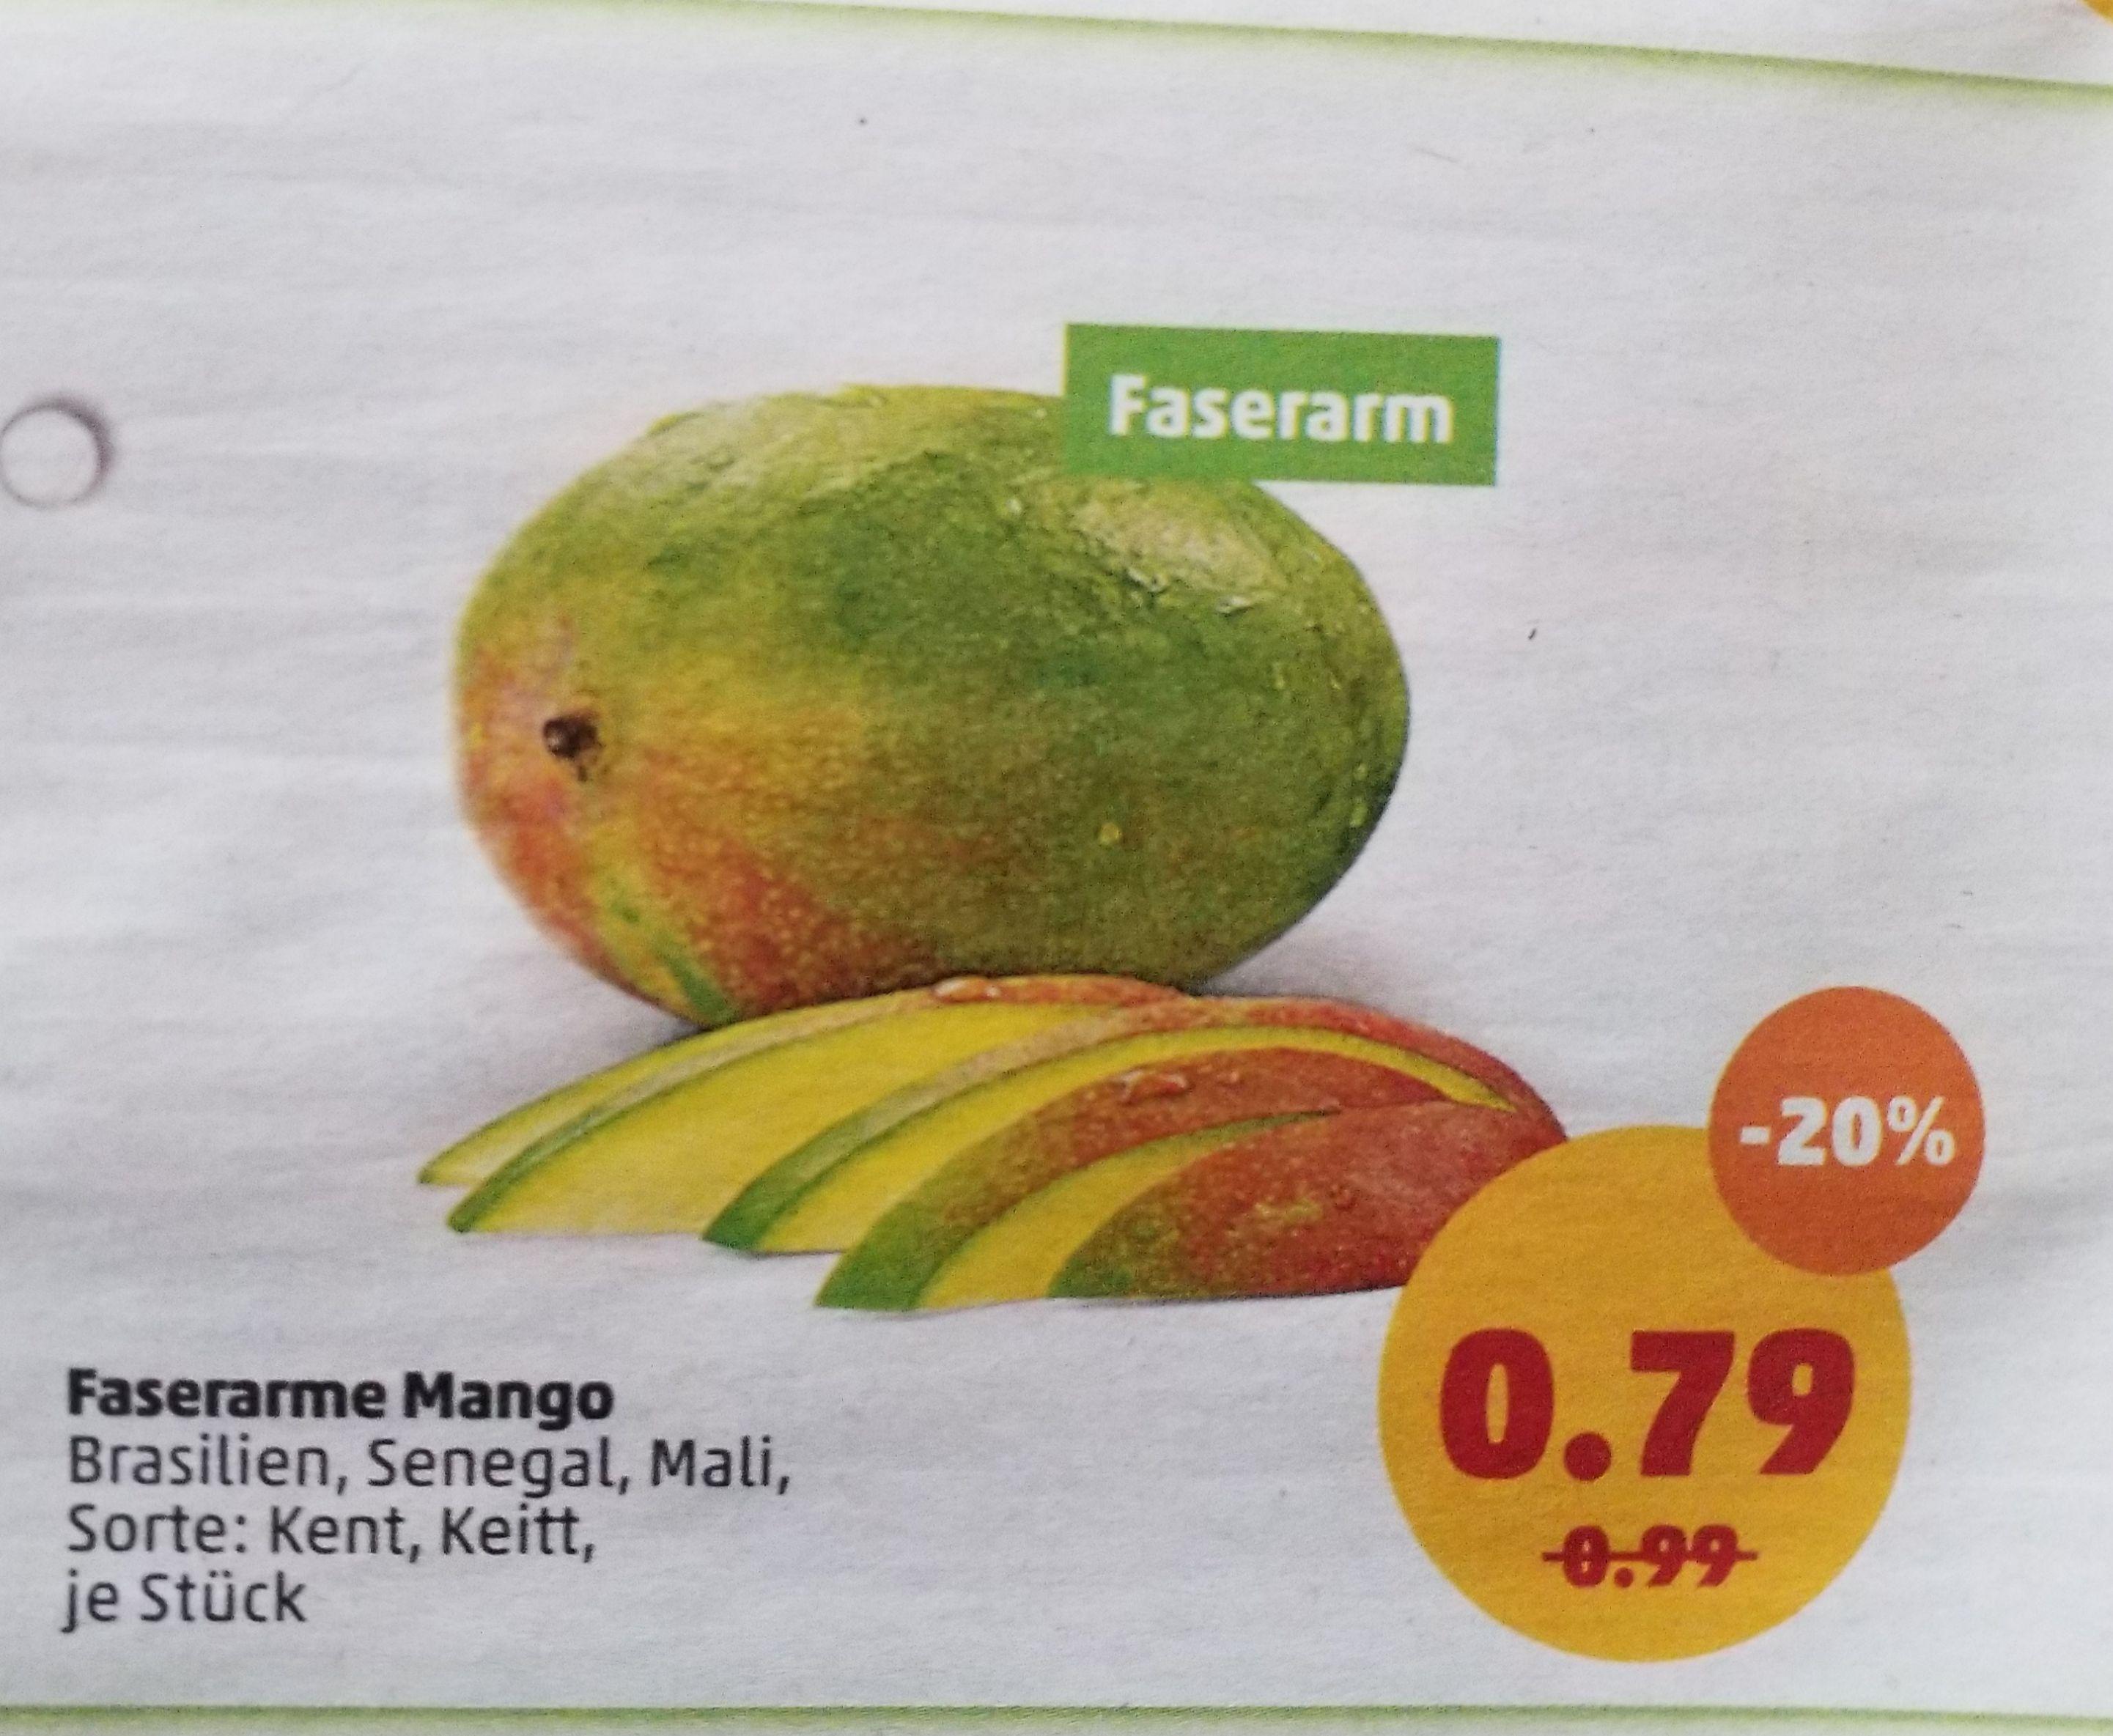 [Penny] Ab 29.04 Mango faserarm für je 0.79€